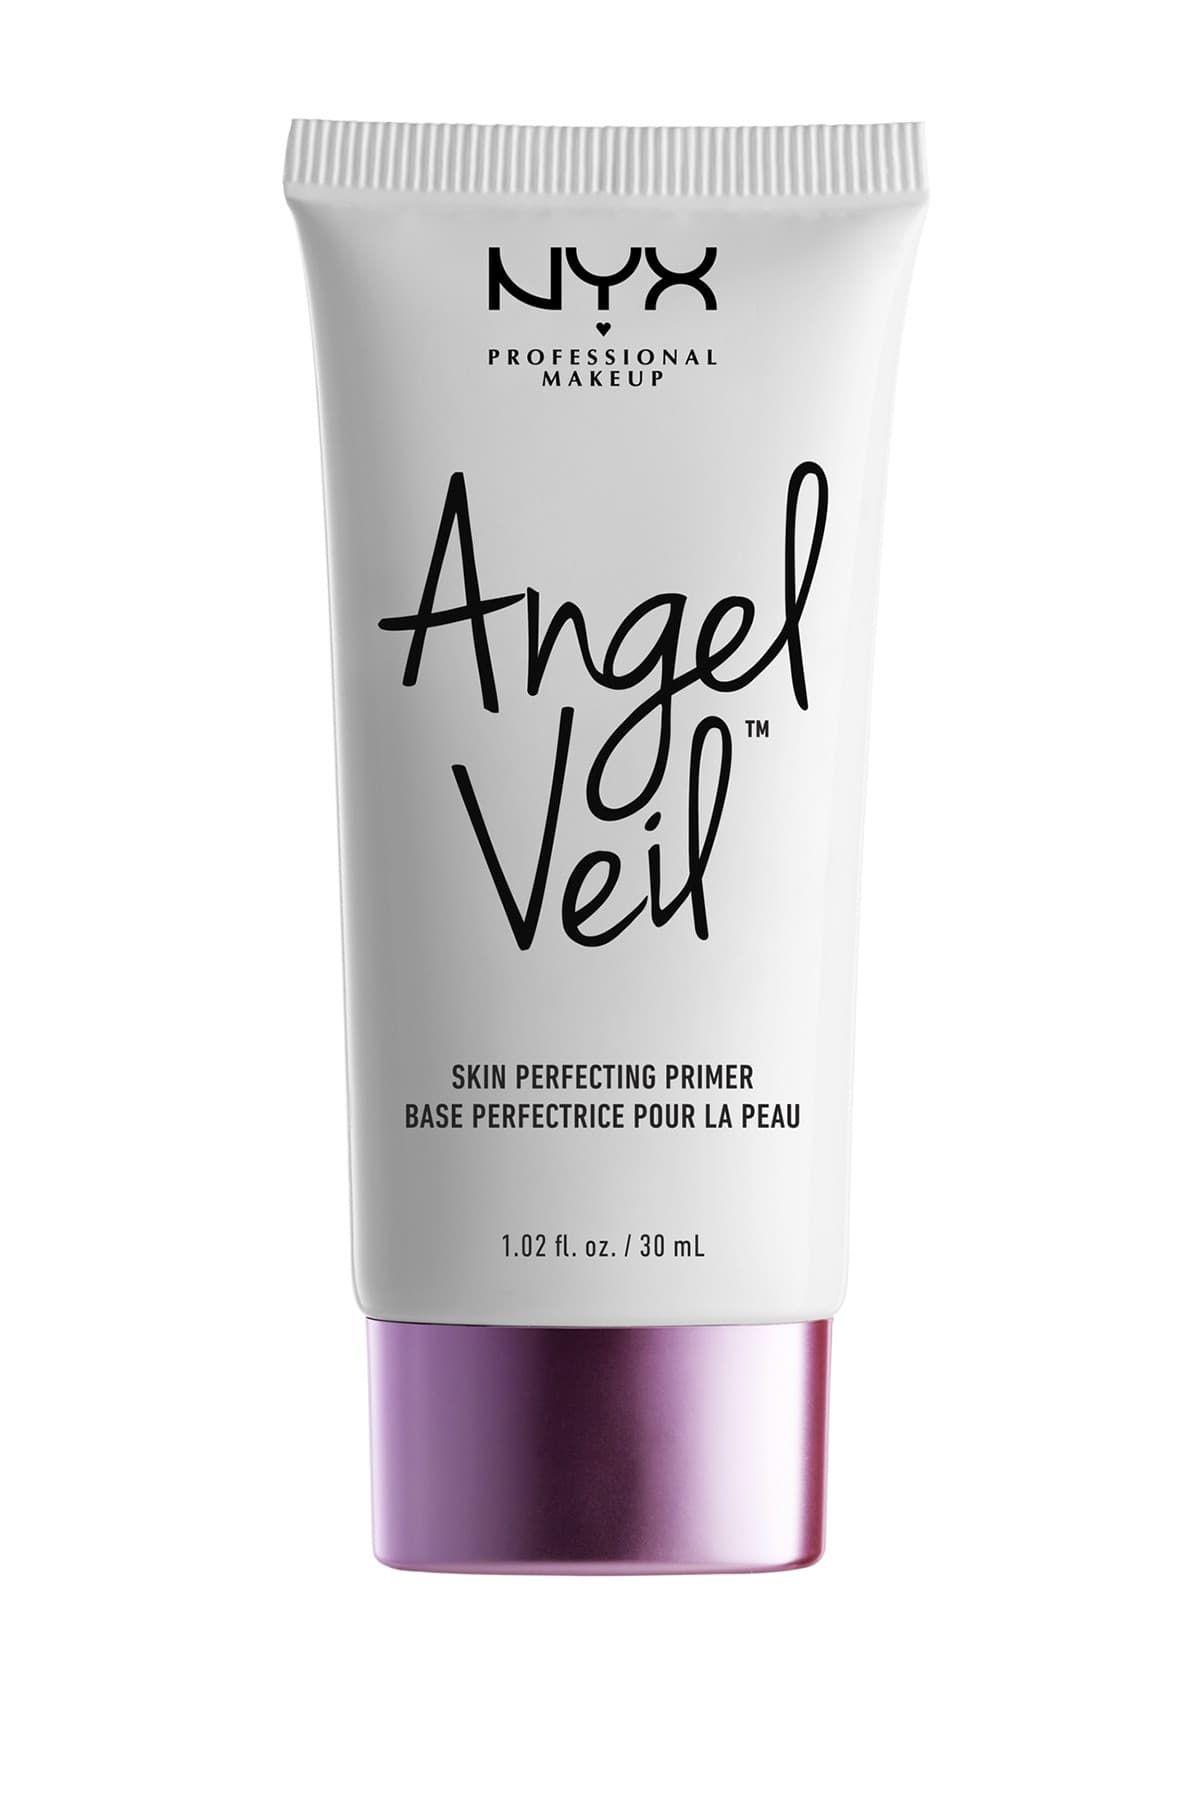 Angel Veil Perfecting Primer Nordstromrack Face Primer For Dry Skin Nyx Professional Makeup Beauty Skin Care